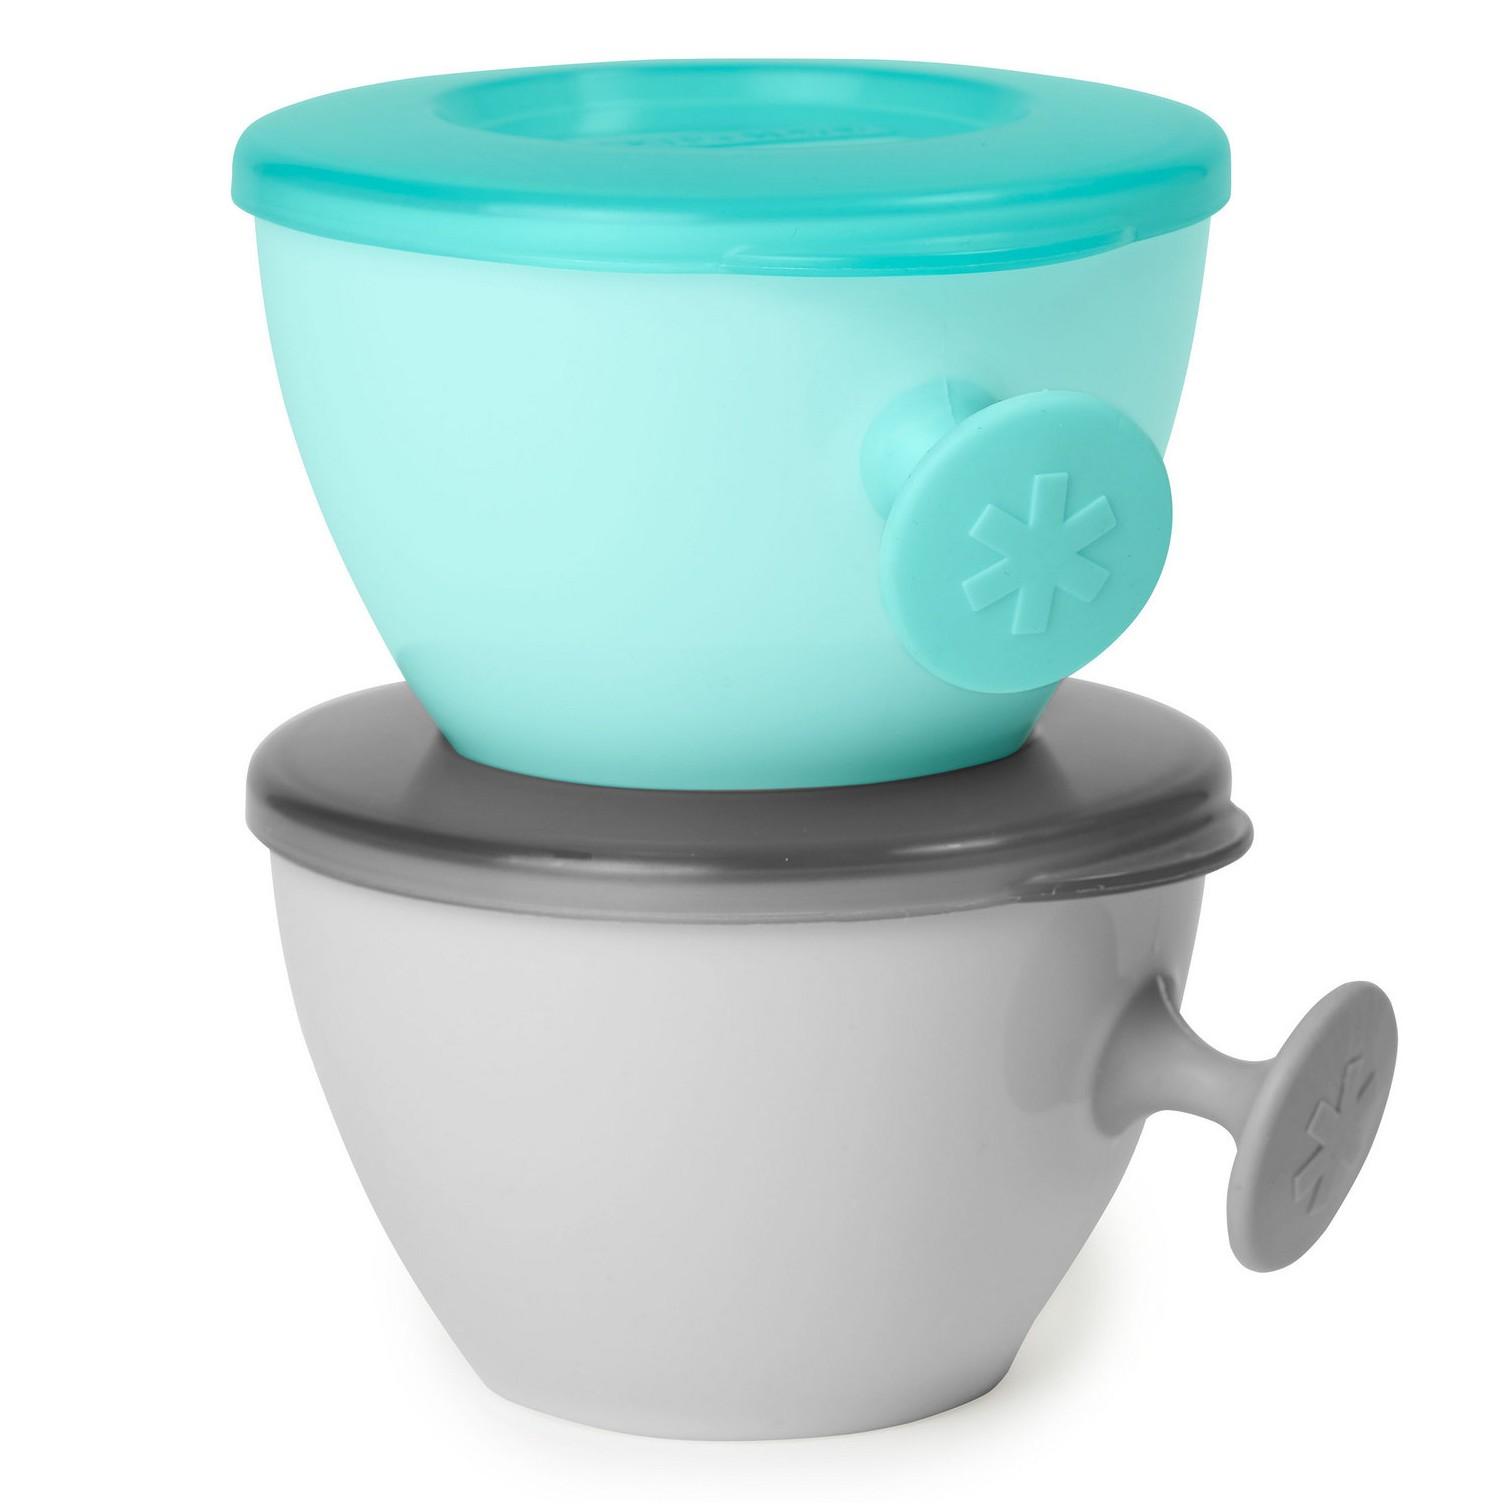 Skiphop | Skip Hop Easy-Grab Bowls Grey